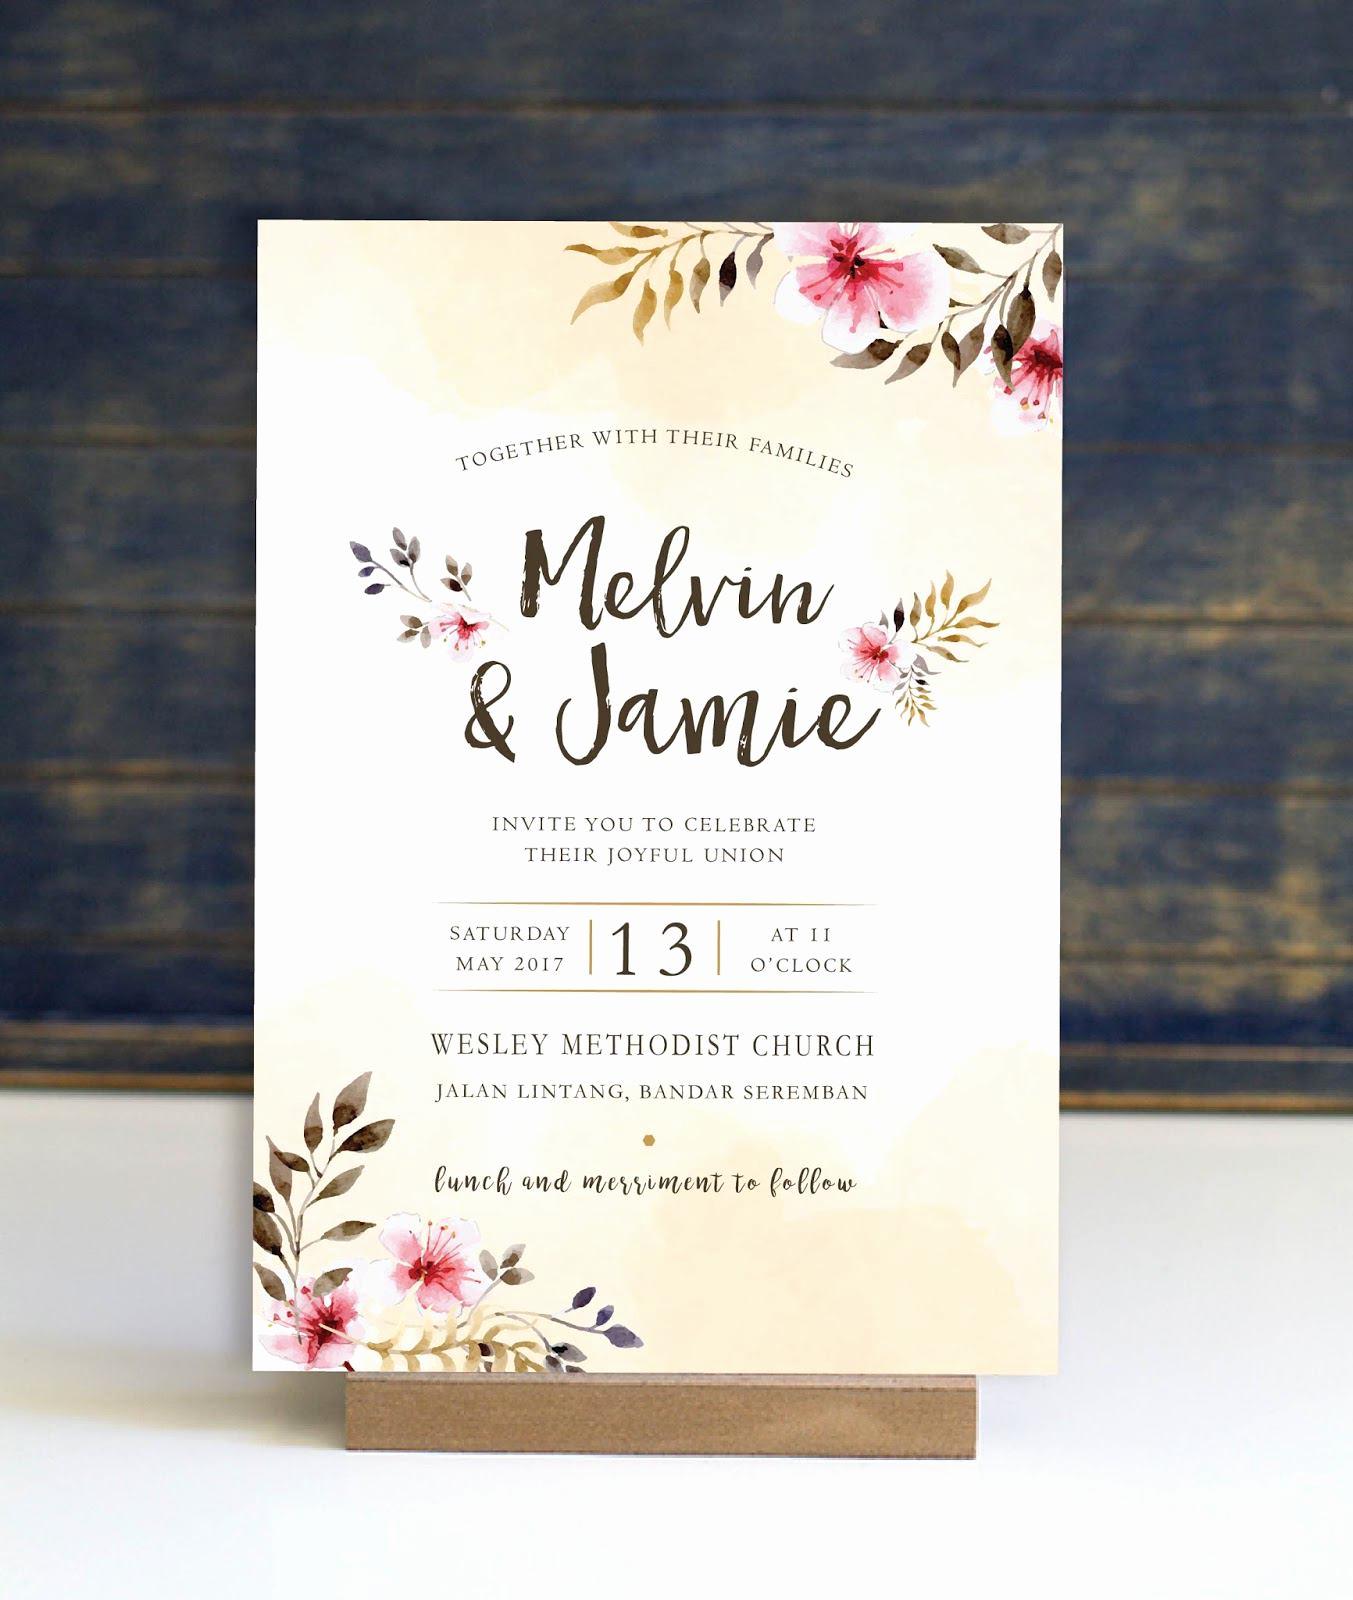 Church Invitation Cards Templates Elegant Birthday Invitation Church Invite Cards Superb